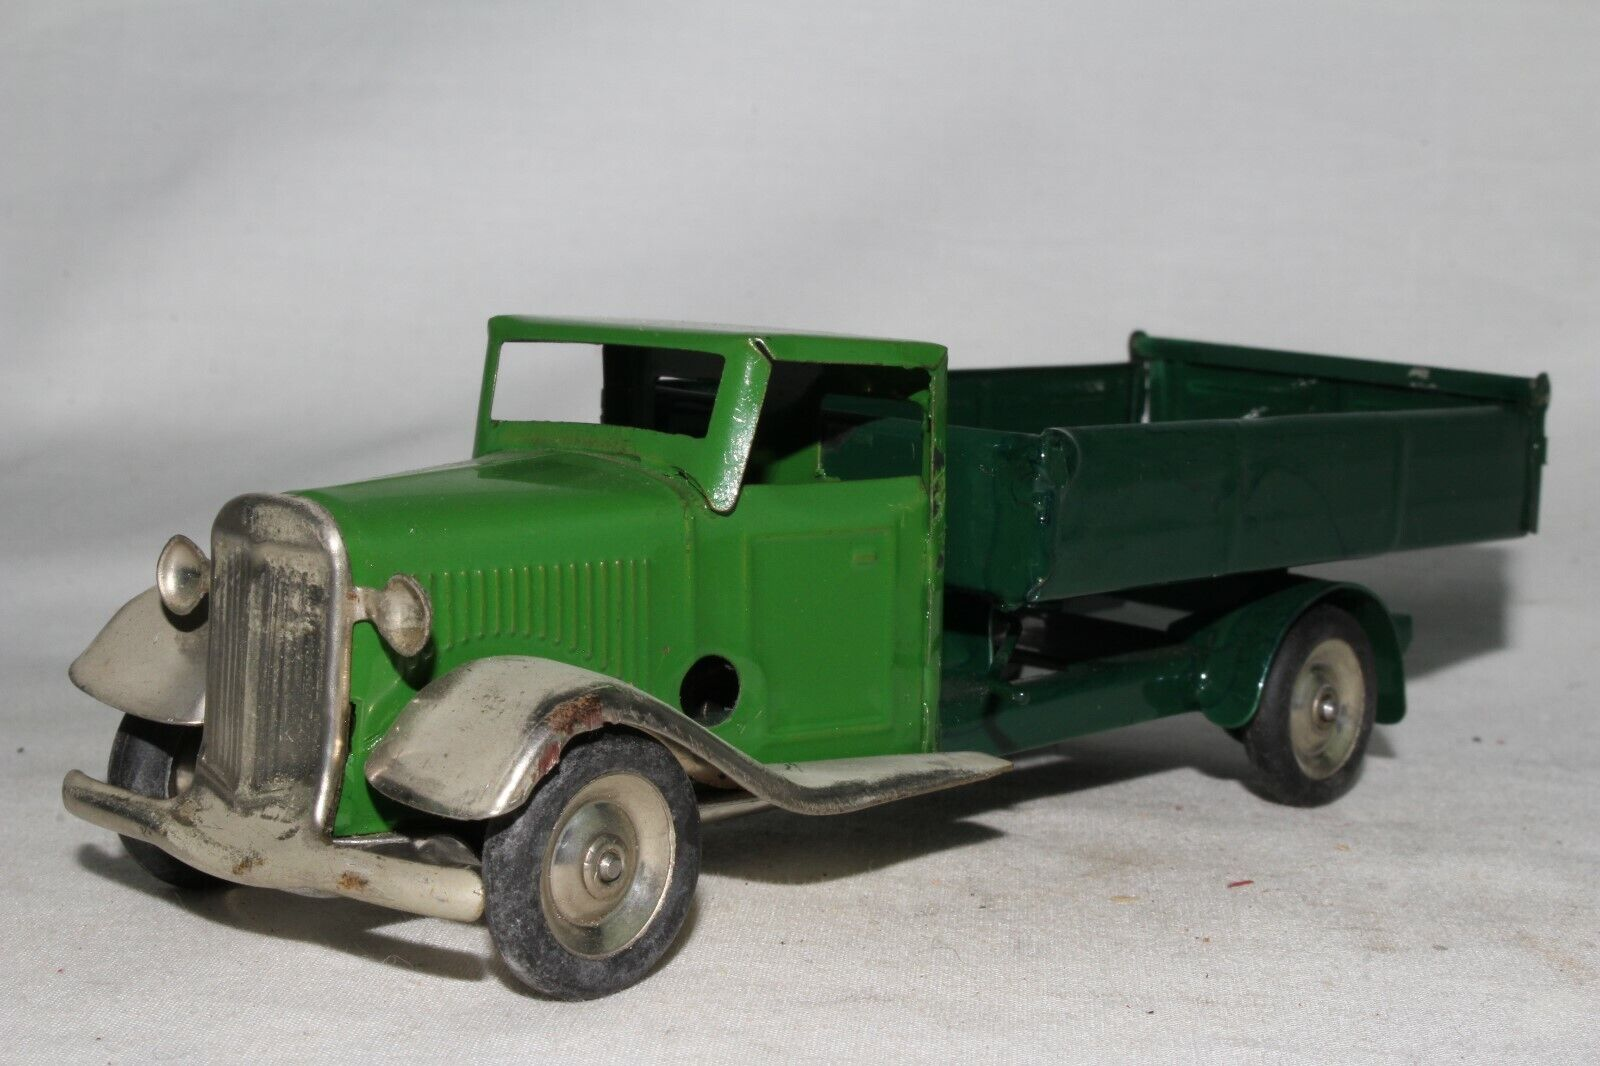 Triang Minic década de 1940 Camión, luz verde Cab, agradable Original